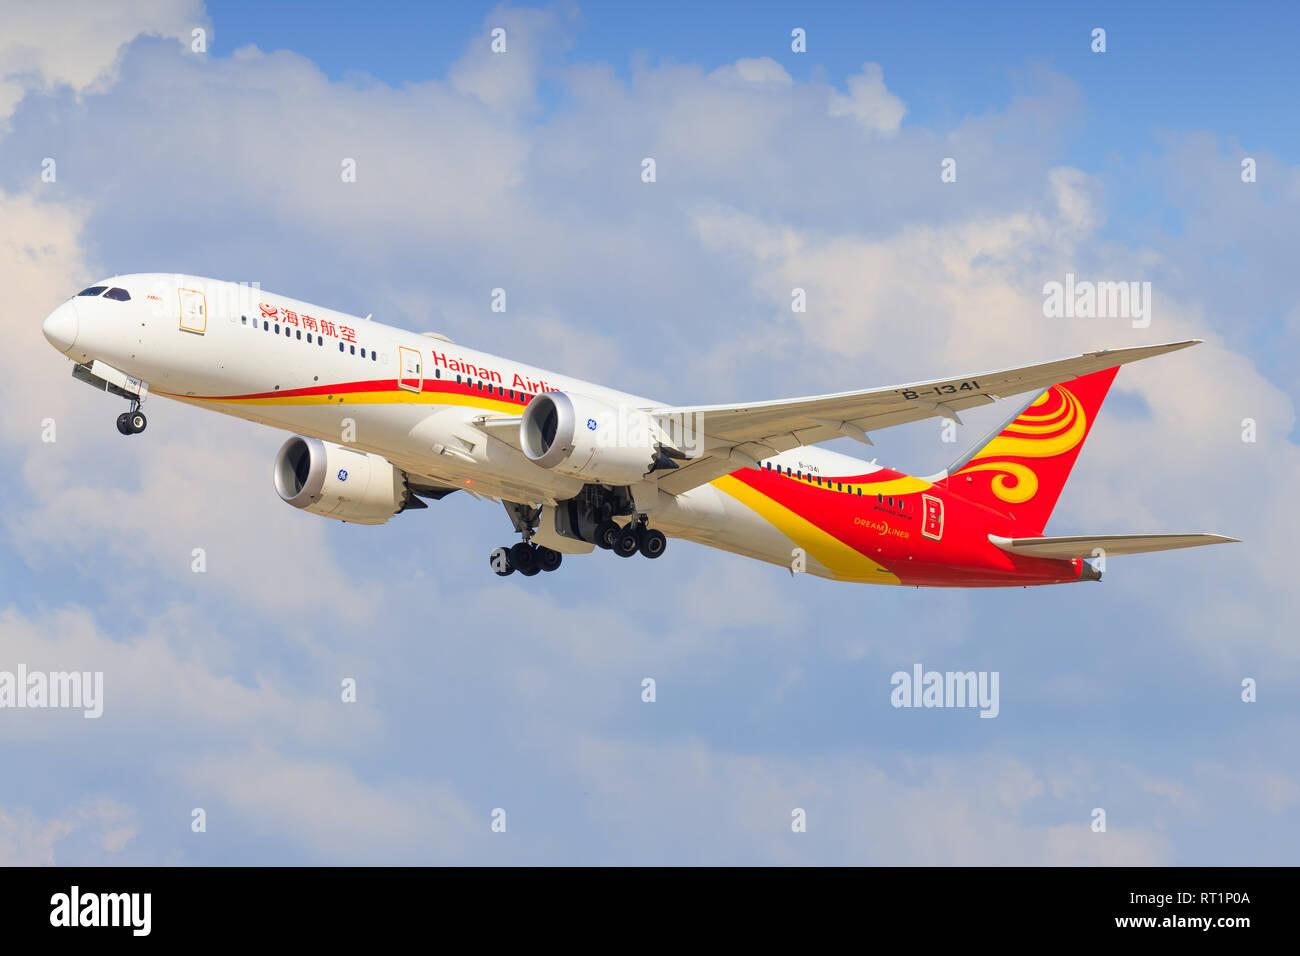 TEL AVIV, ISRAEL-February 24, 2019: Boeing 787 of Hainan At Ben-Gurion international Airport. - Stock Image